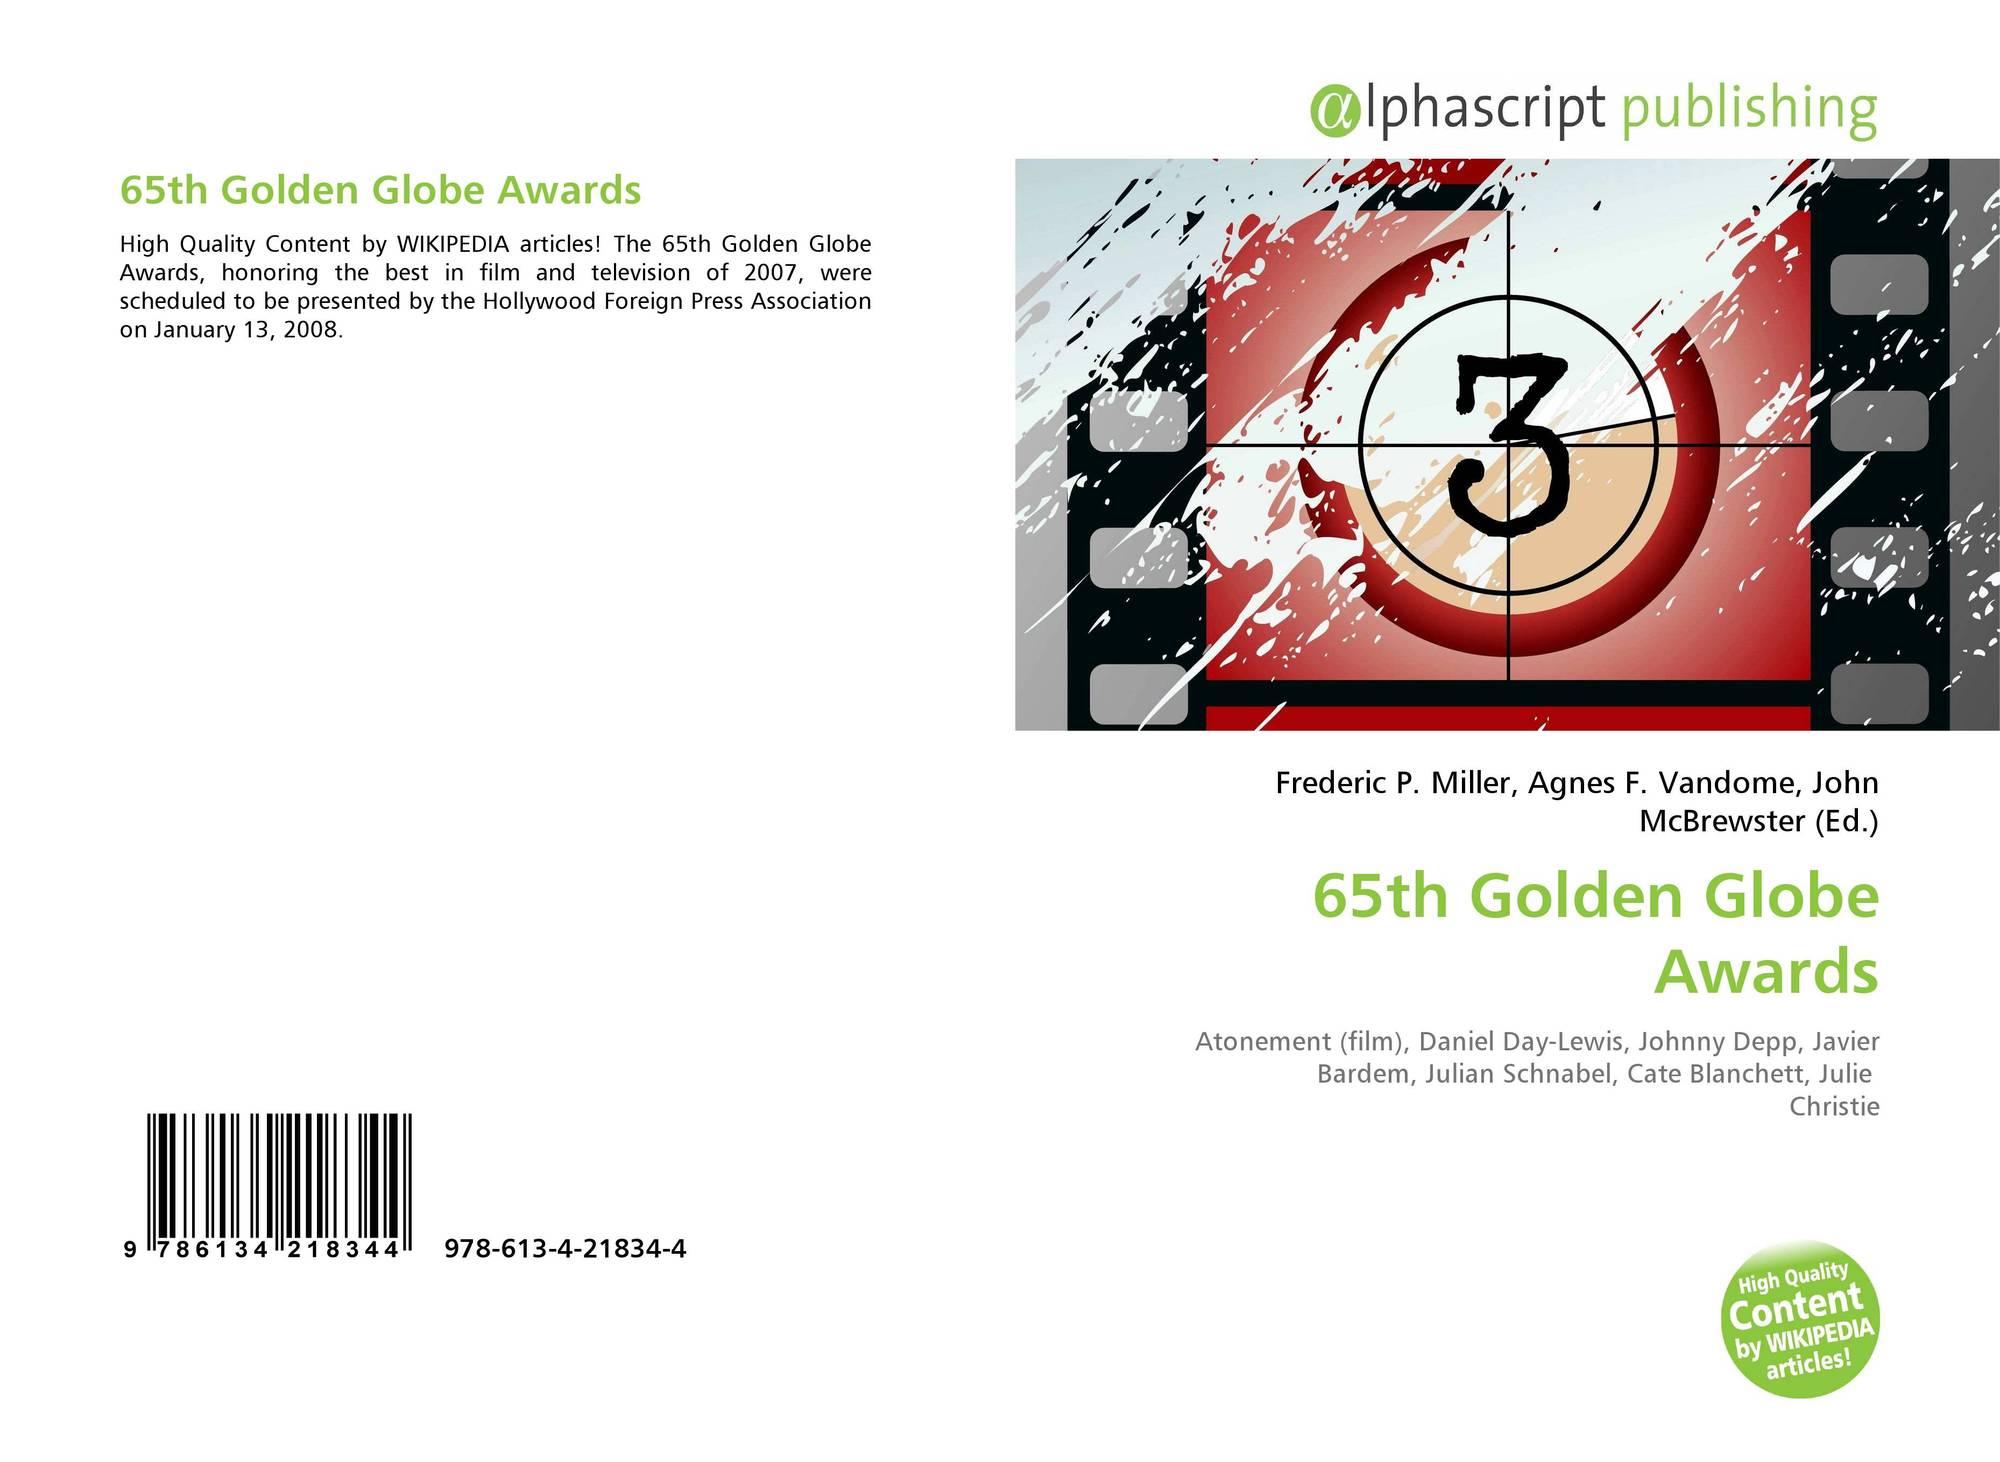 Bookcover Of 65th Golden Globe Awards Omni Badge 9307e2201e5f762643a64561af3456be64a87707602f96b92ef18a9bbcada116